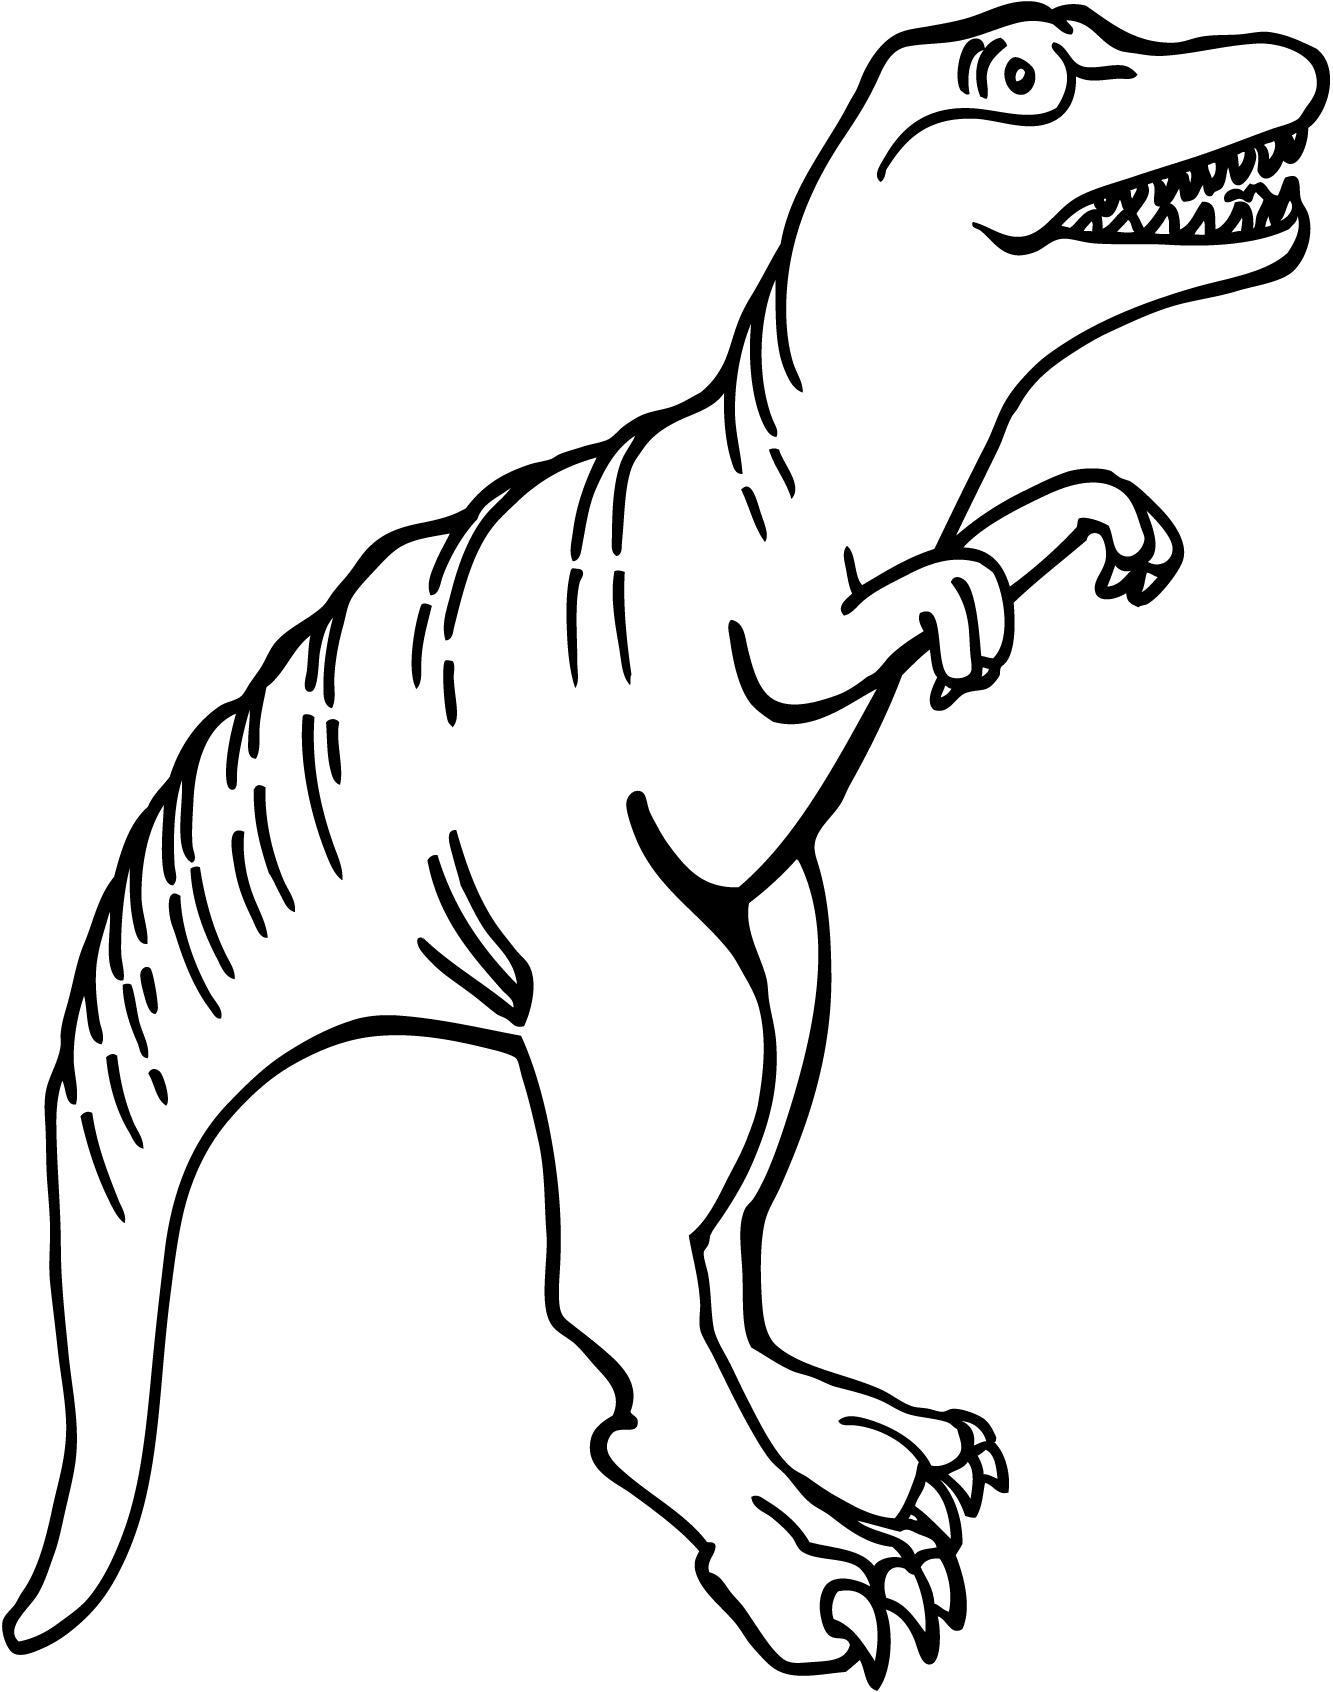 1333x1692 Tyrannosaurus Rex clipart black and white